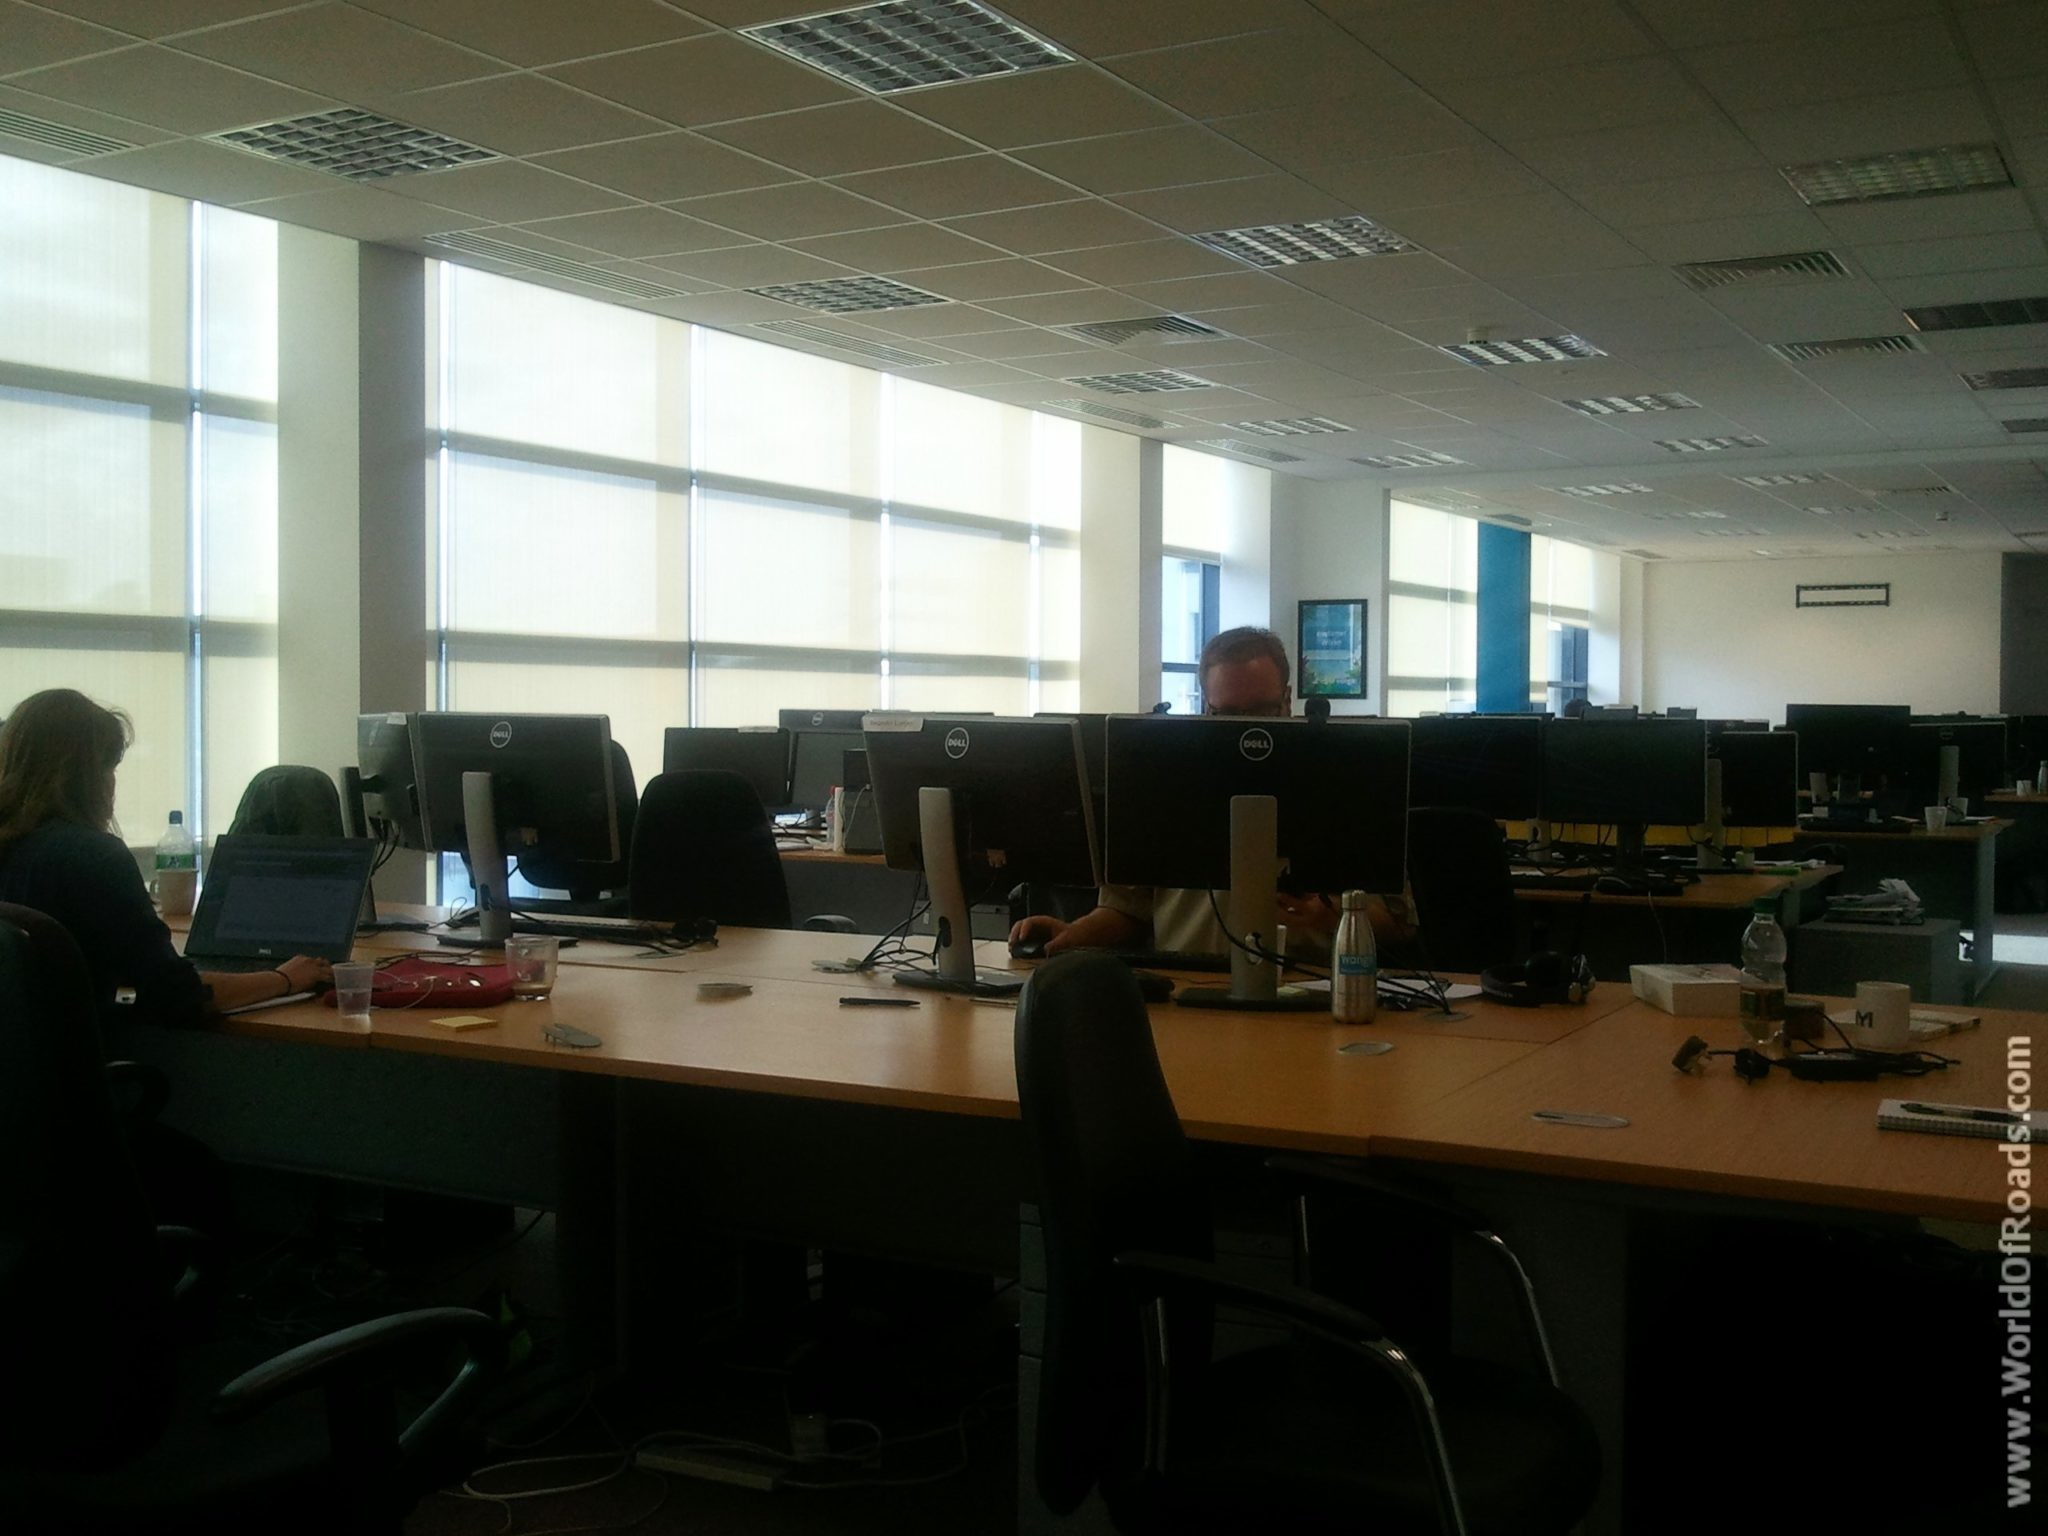 Офис в Дублине. Ирландия.